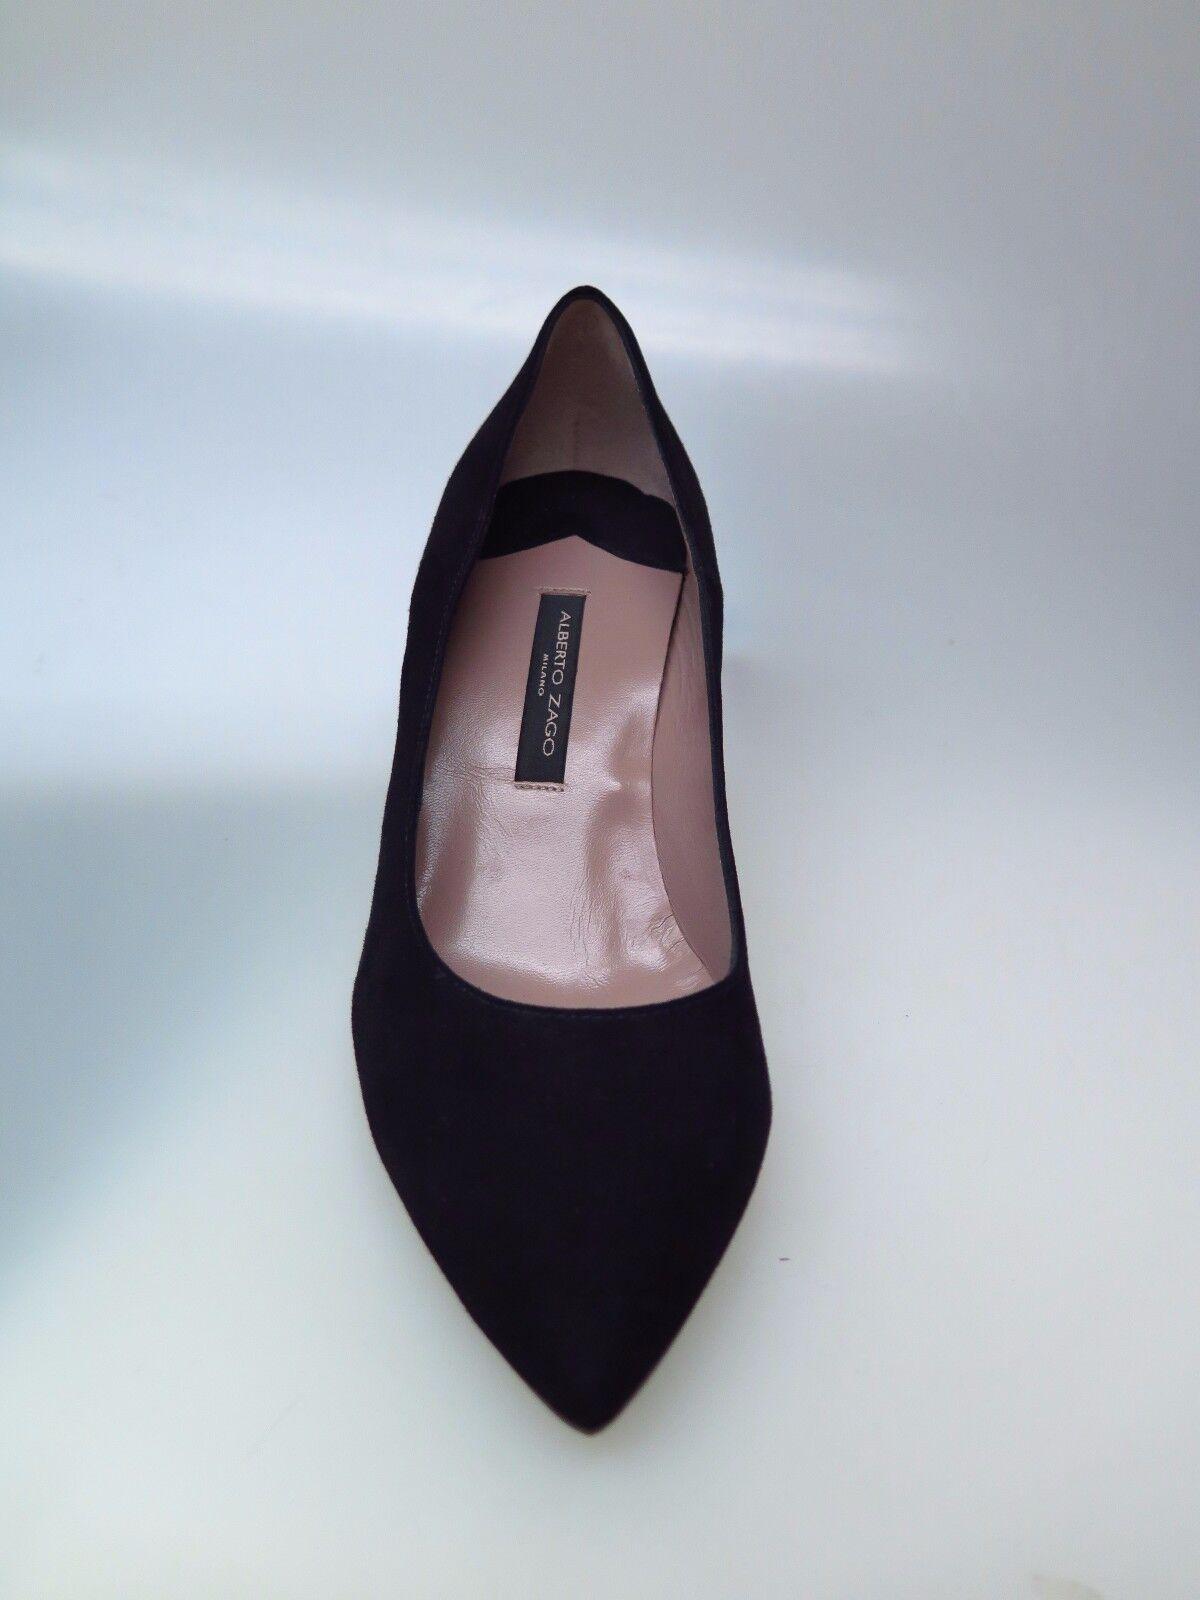 ALBERTO ZAGO Damenschuhe Schuhe A33374 Camoscio schwarz schwarz schwarz Ala Gr. EU 37,5  | Primäre Qualität  42a00b